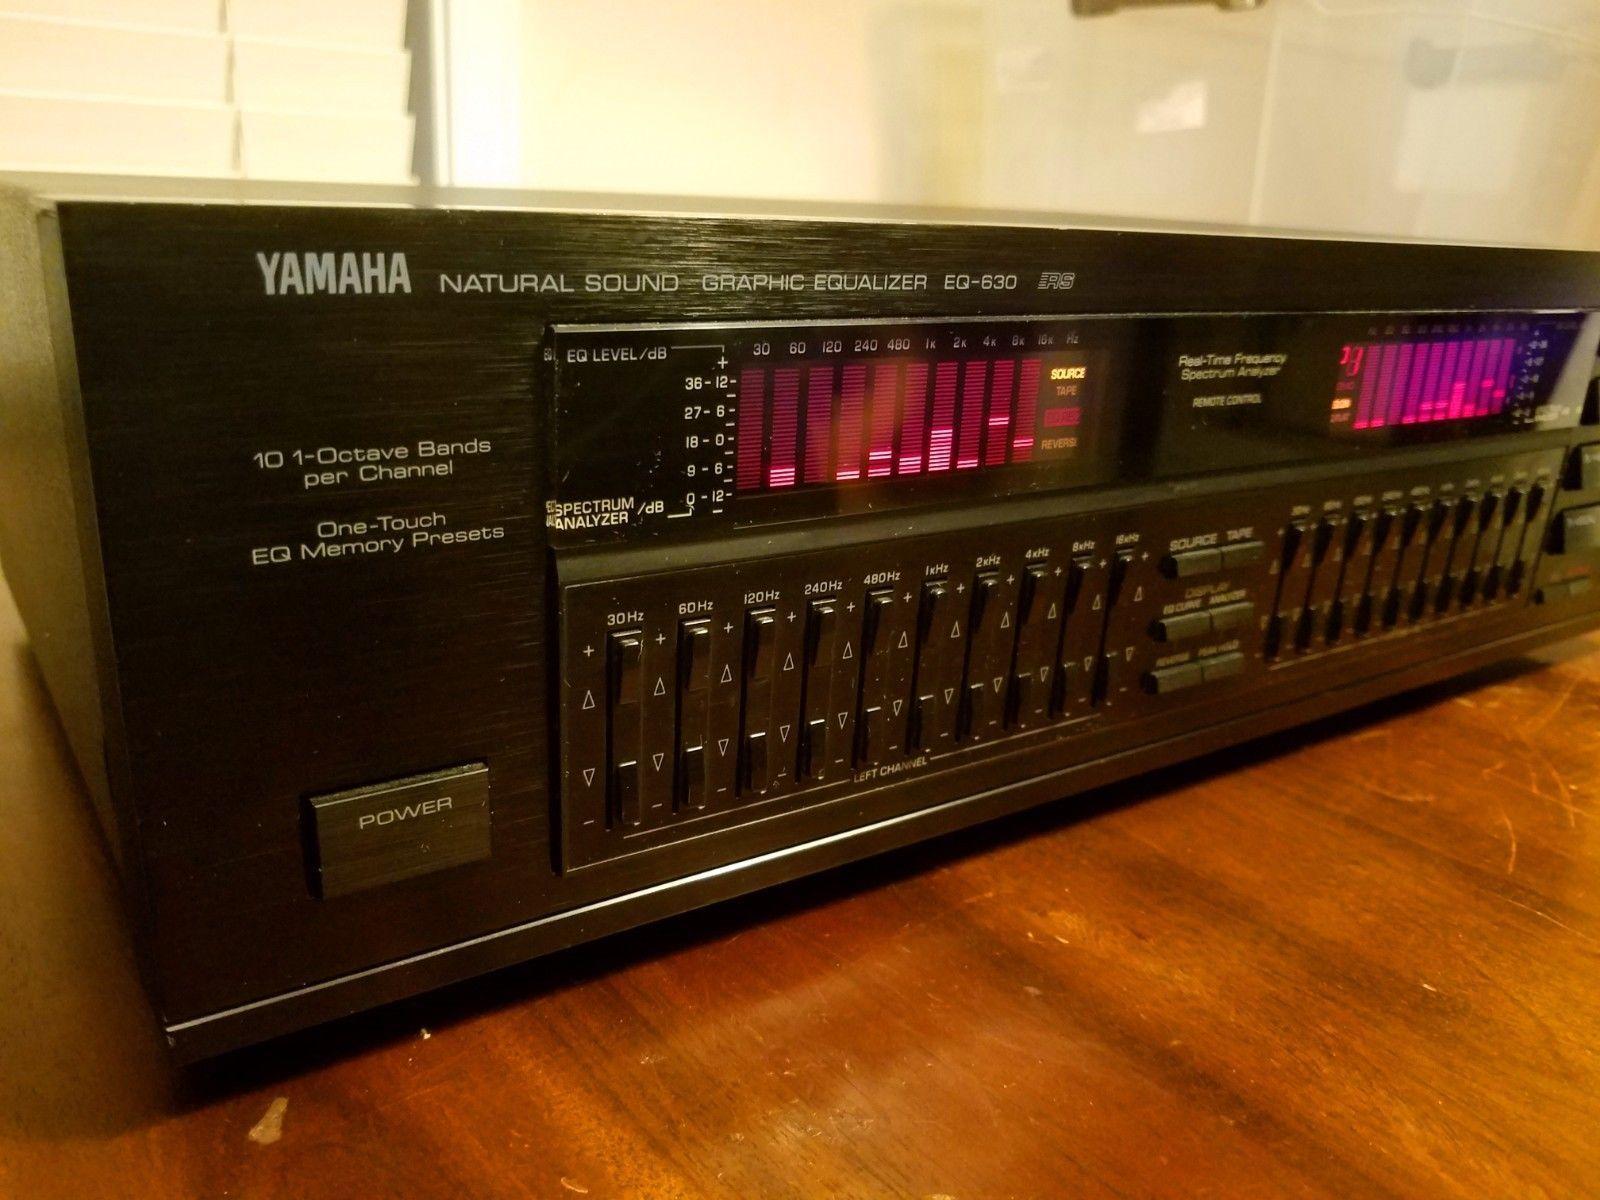 Yamaha EQ-630 Natural Sound Graphic Equalizer | eBay | Audio Graphic